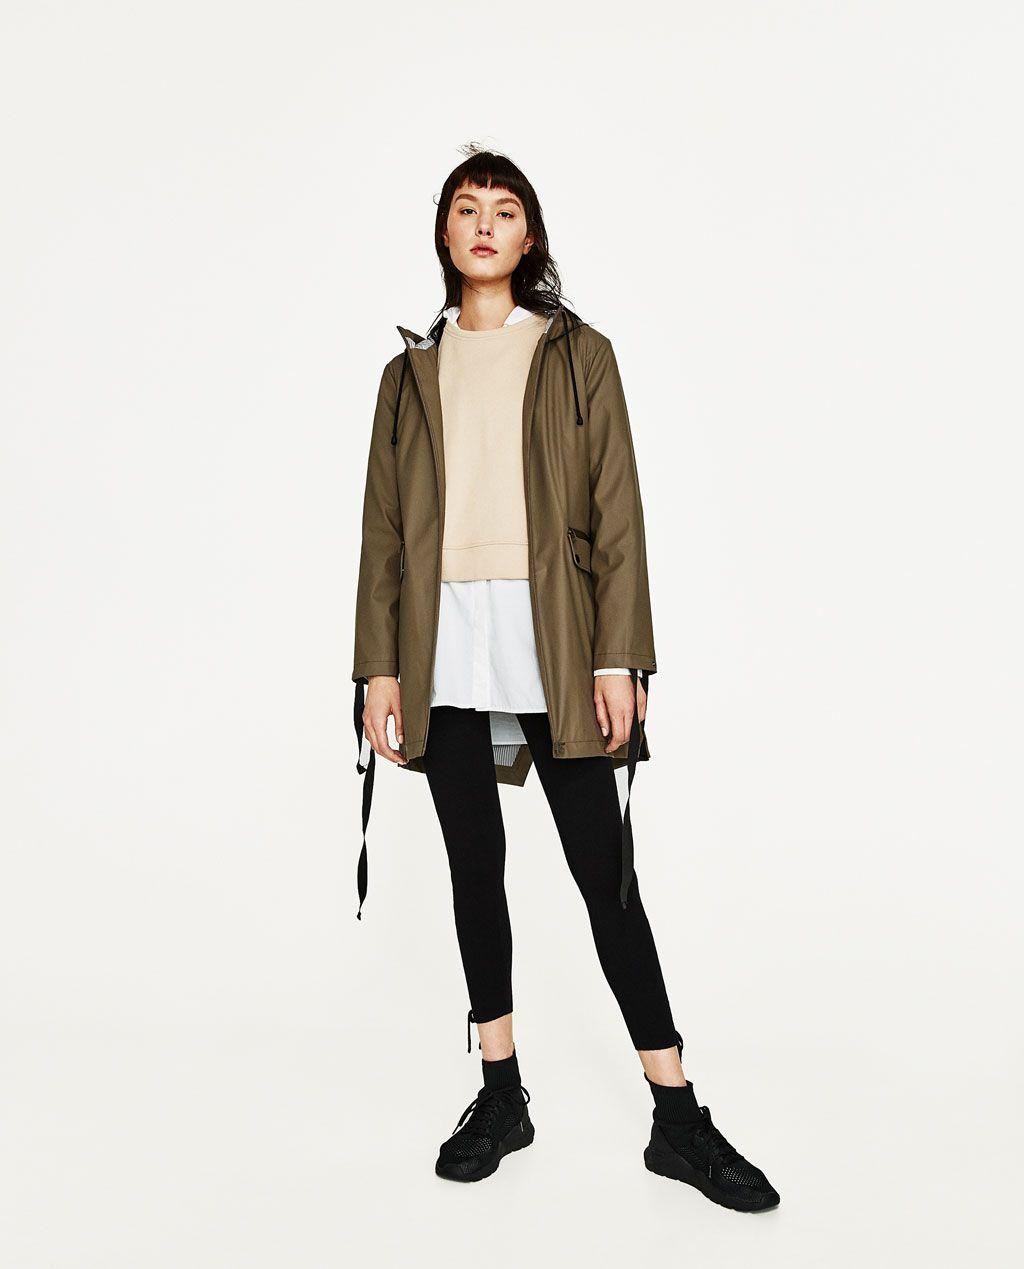 1bda6c52 ZARA - WOMAN - WATER REPELLENT PARKA Watch Sale, Next Clothes, Zara Women,